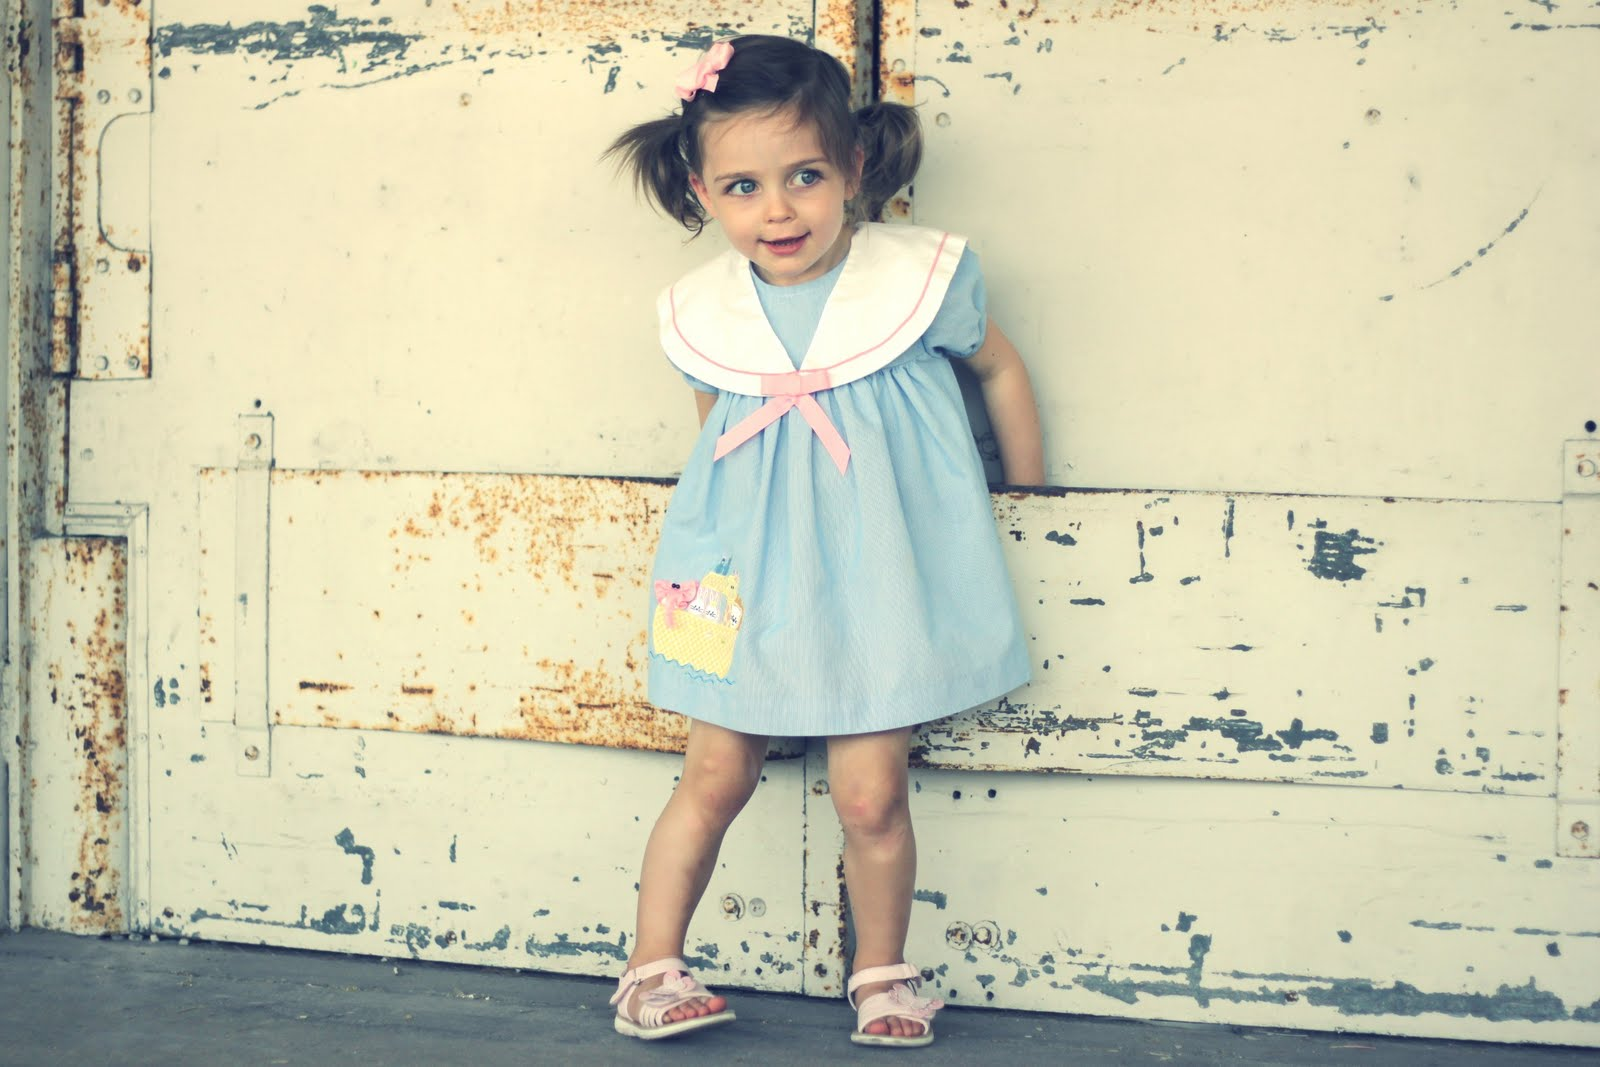 Vintage Looking Baby Clothes